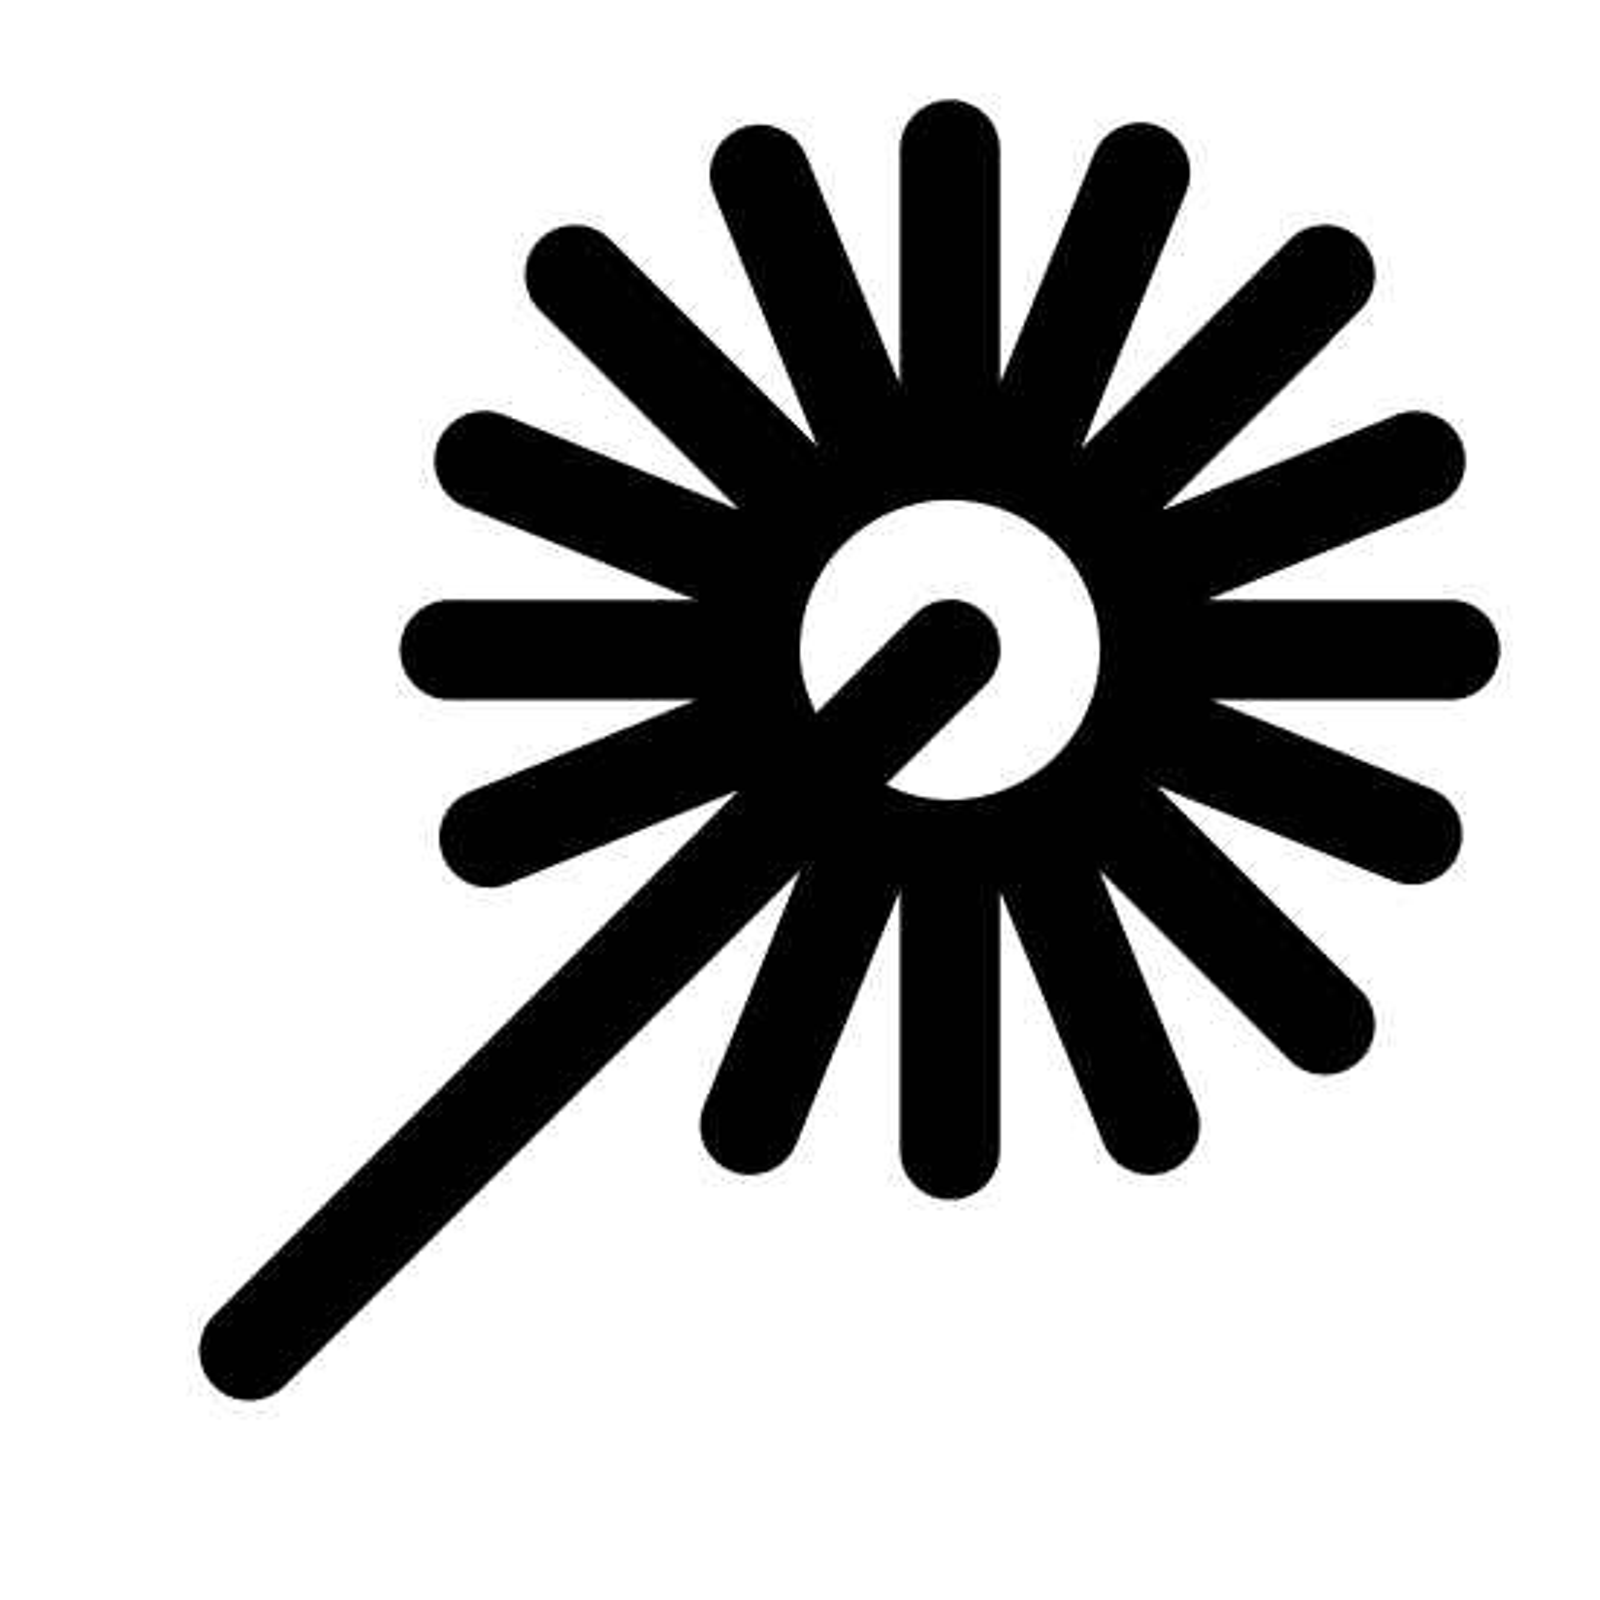 Brylant icon